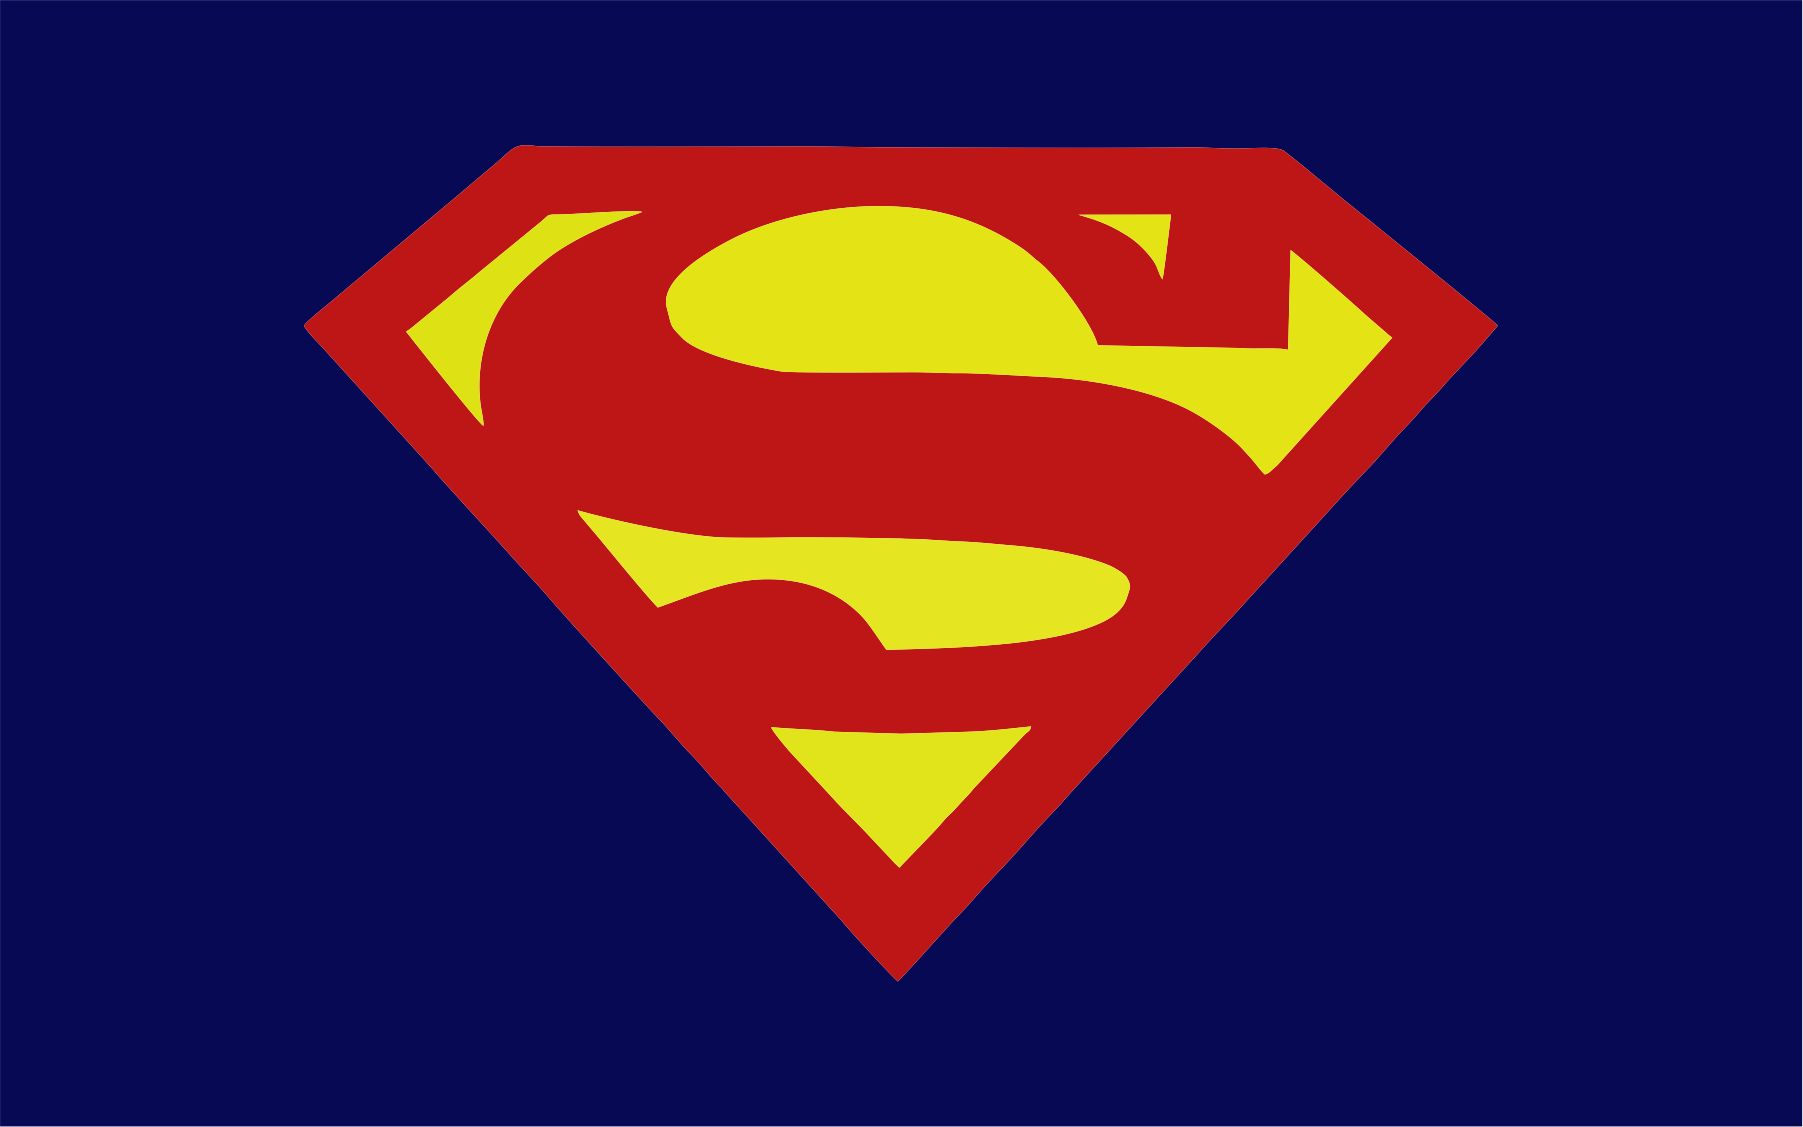 superman logo by benokil - photo #28